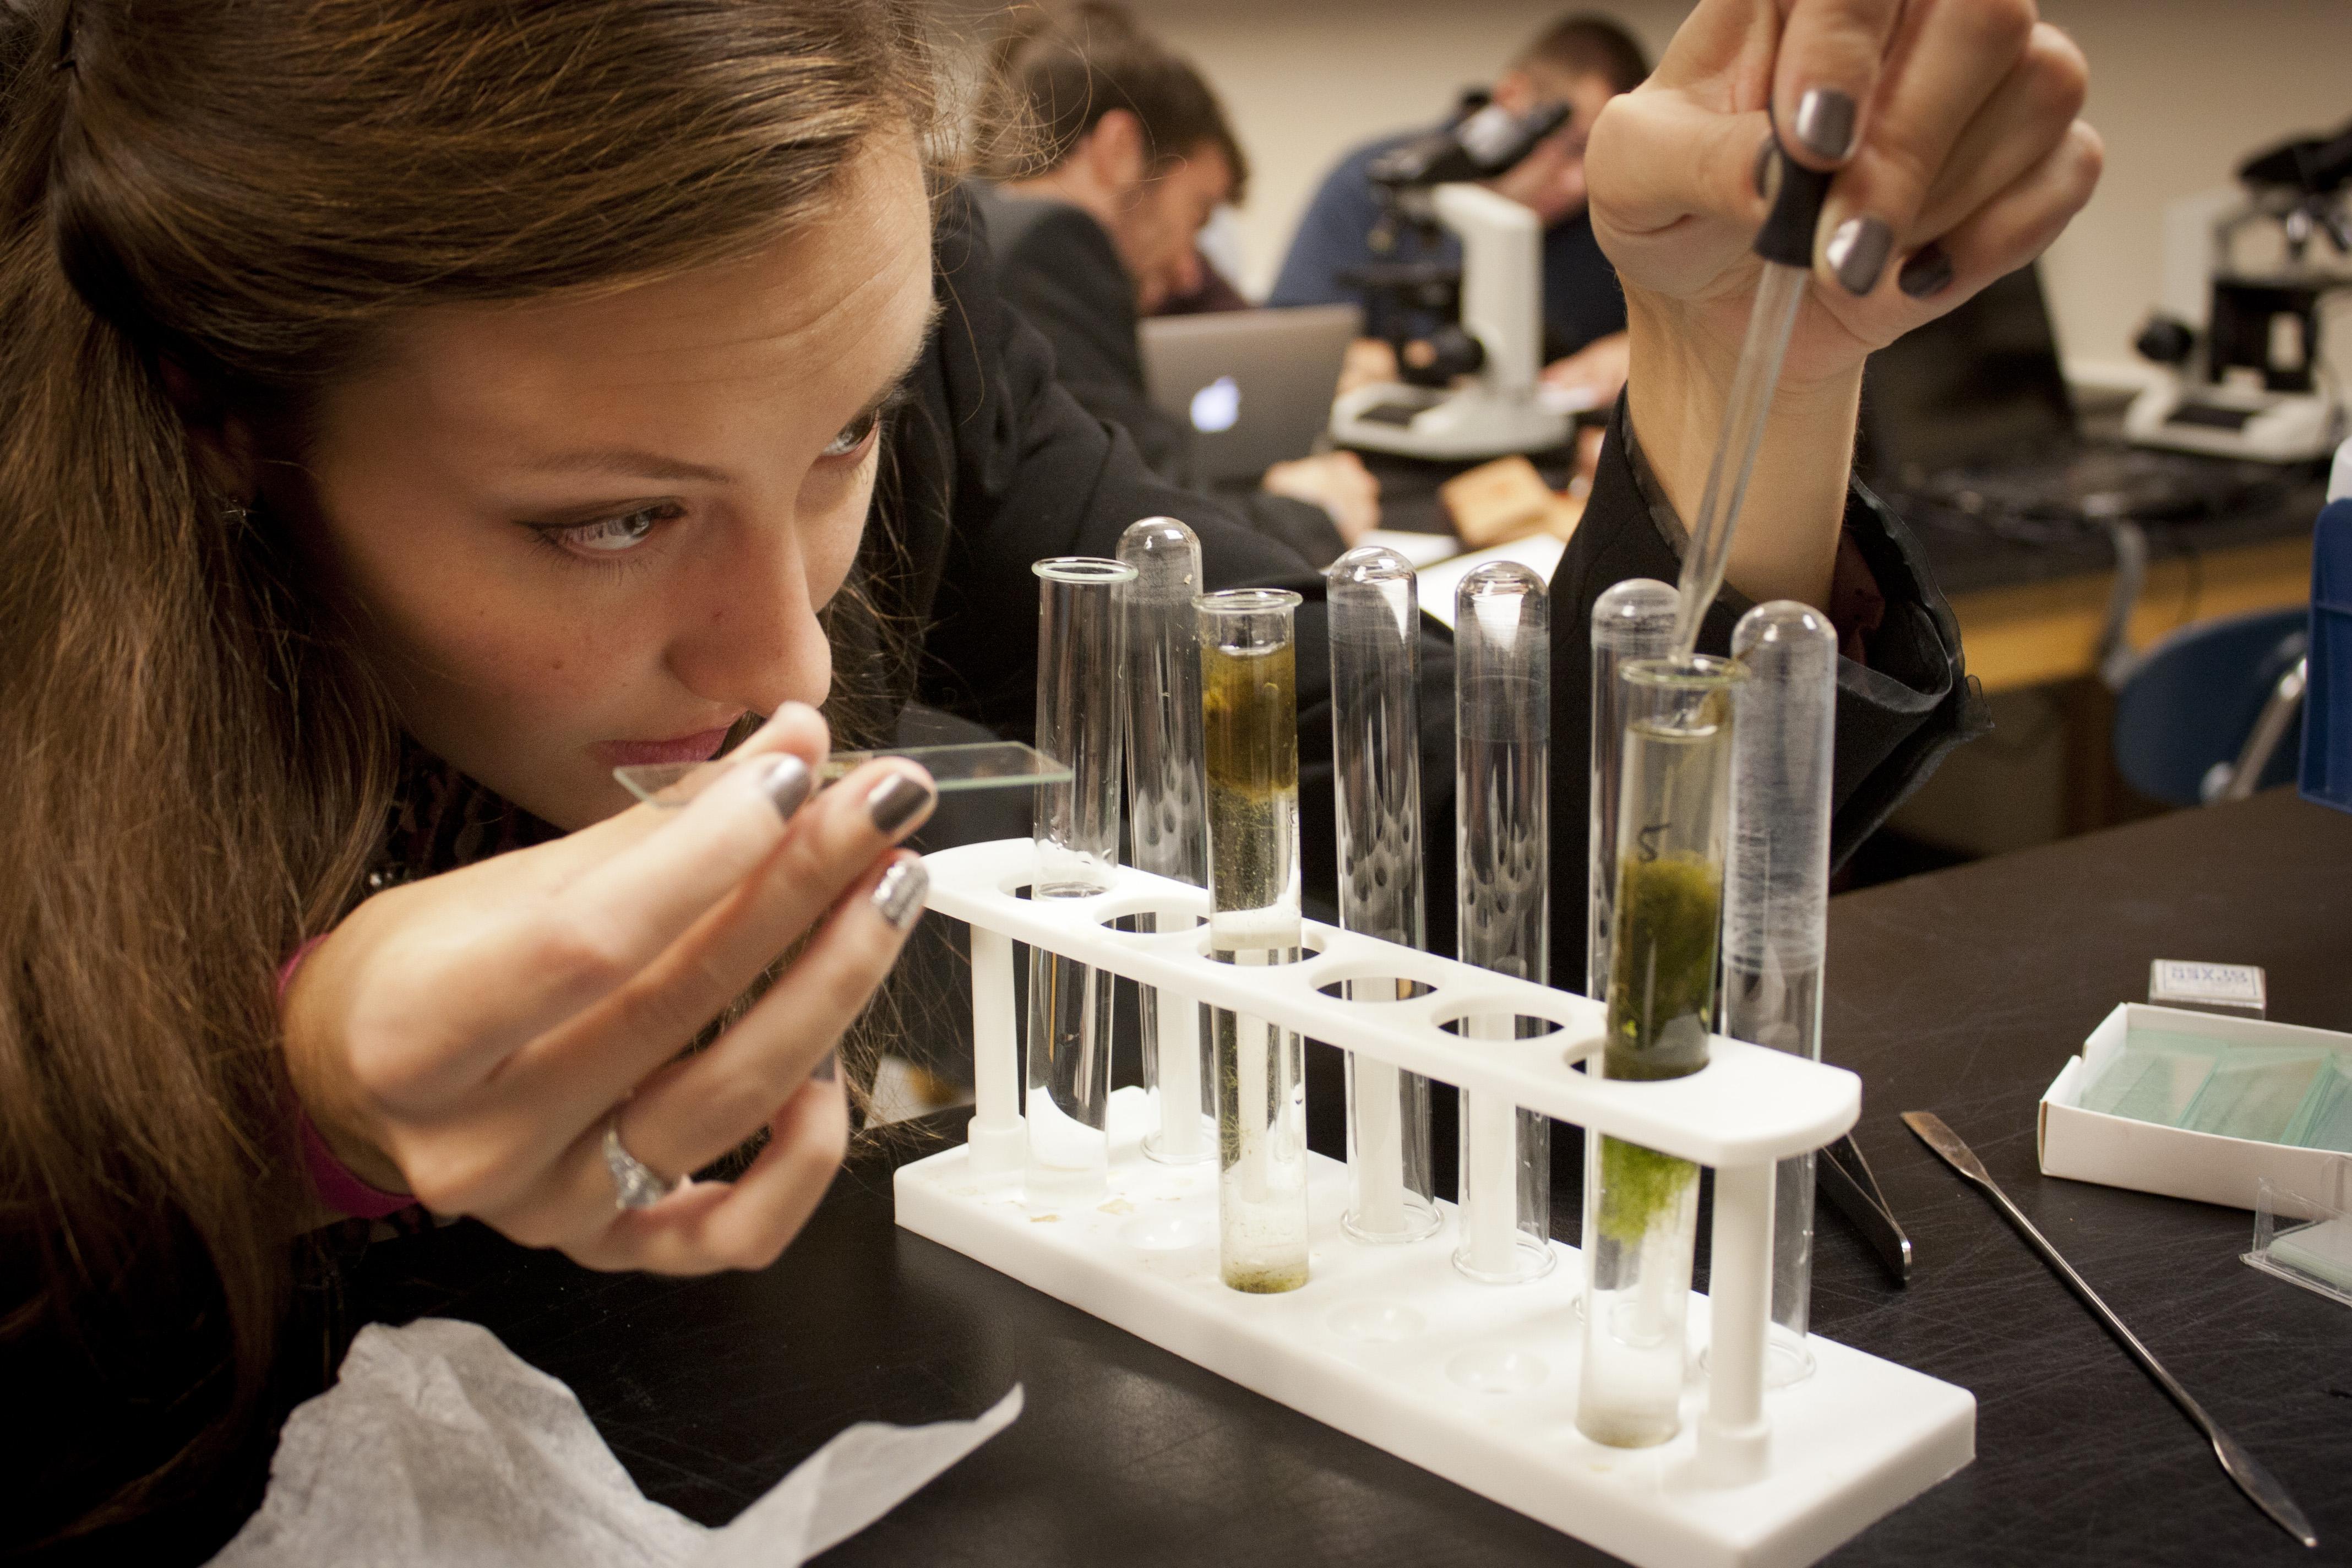 Patrick Henry College biology lab